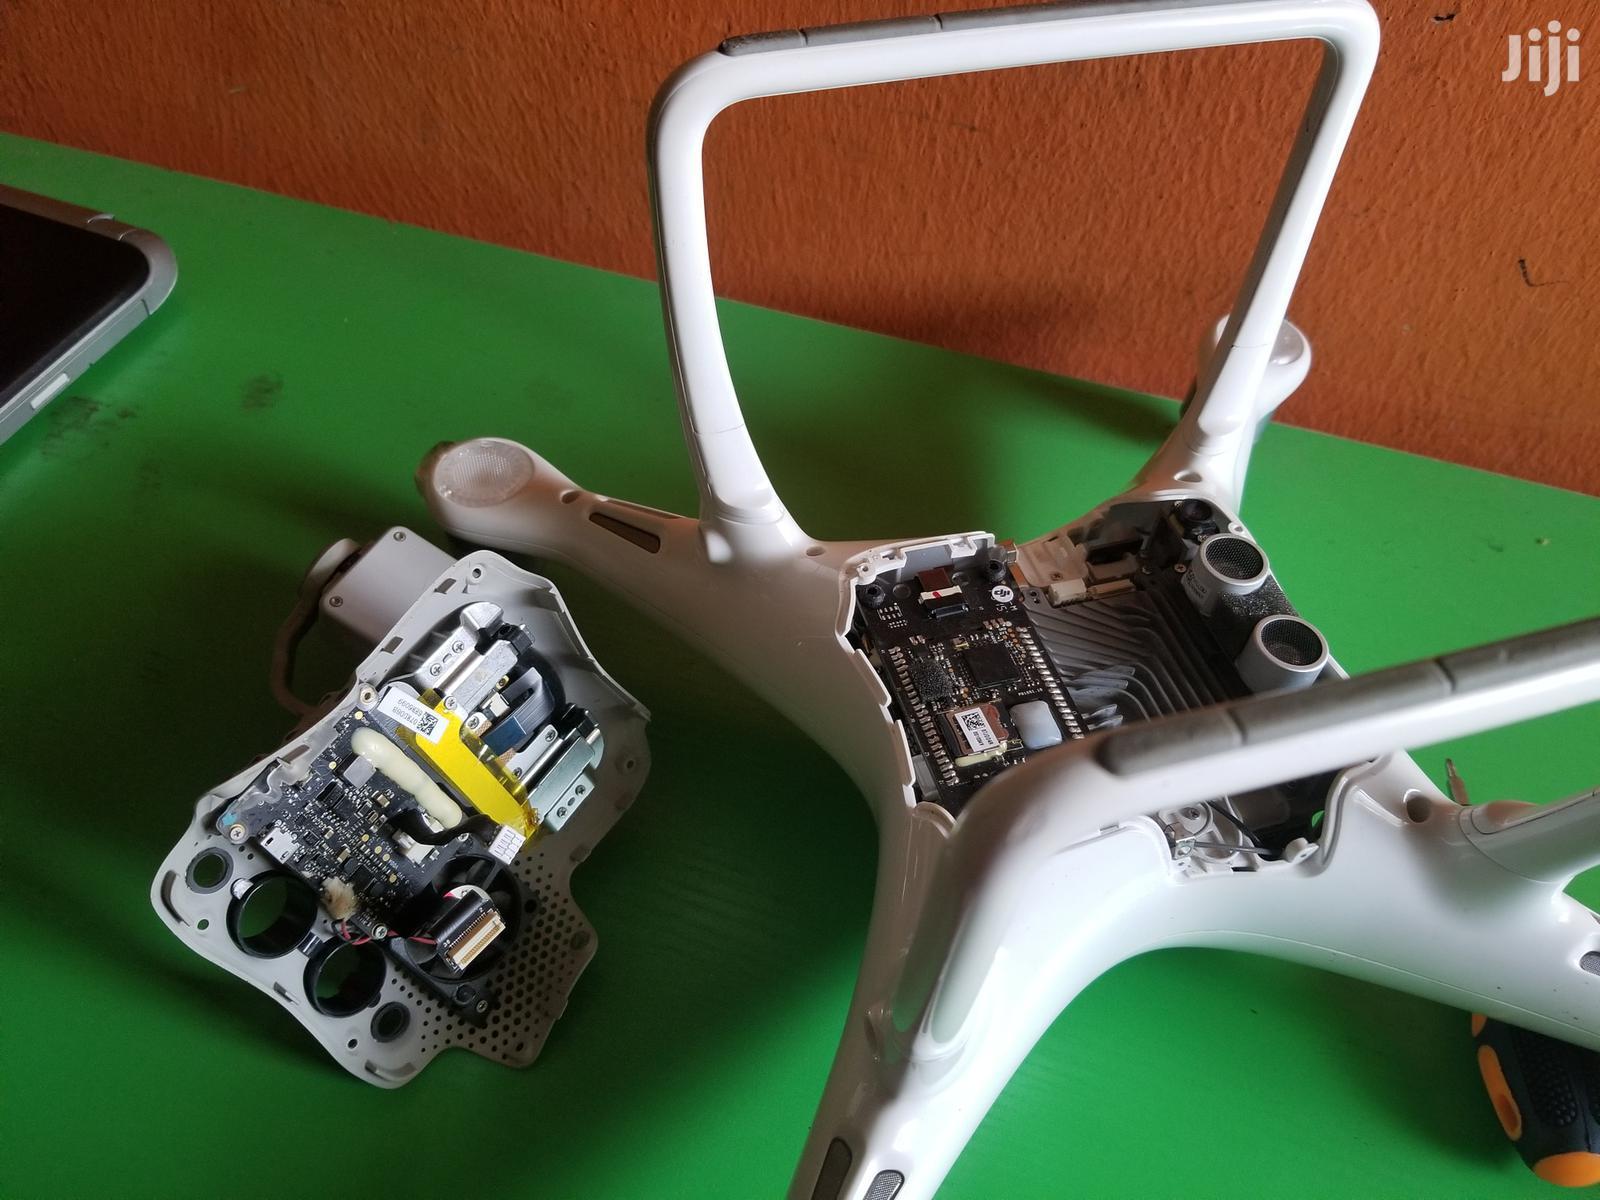 Archive: DJI Drone Repair Service Phantom 3, 4, 4pro in Ikeja - Repair  Services, Jerry Anthony | Jiji.ng